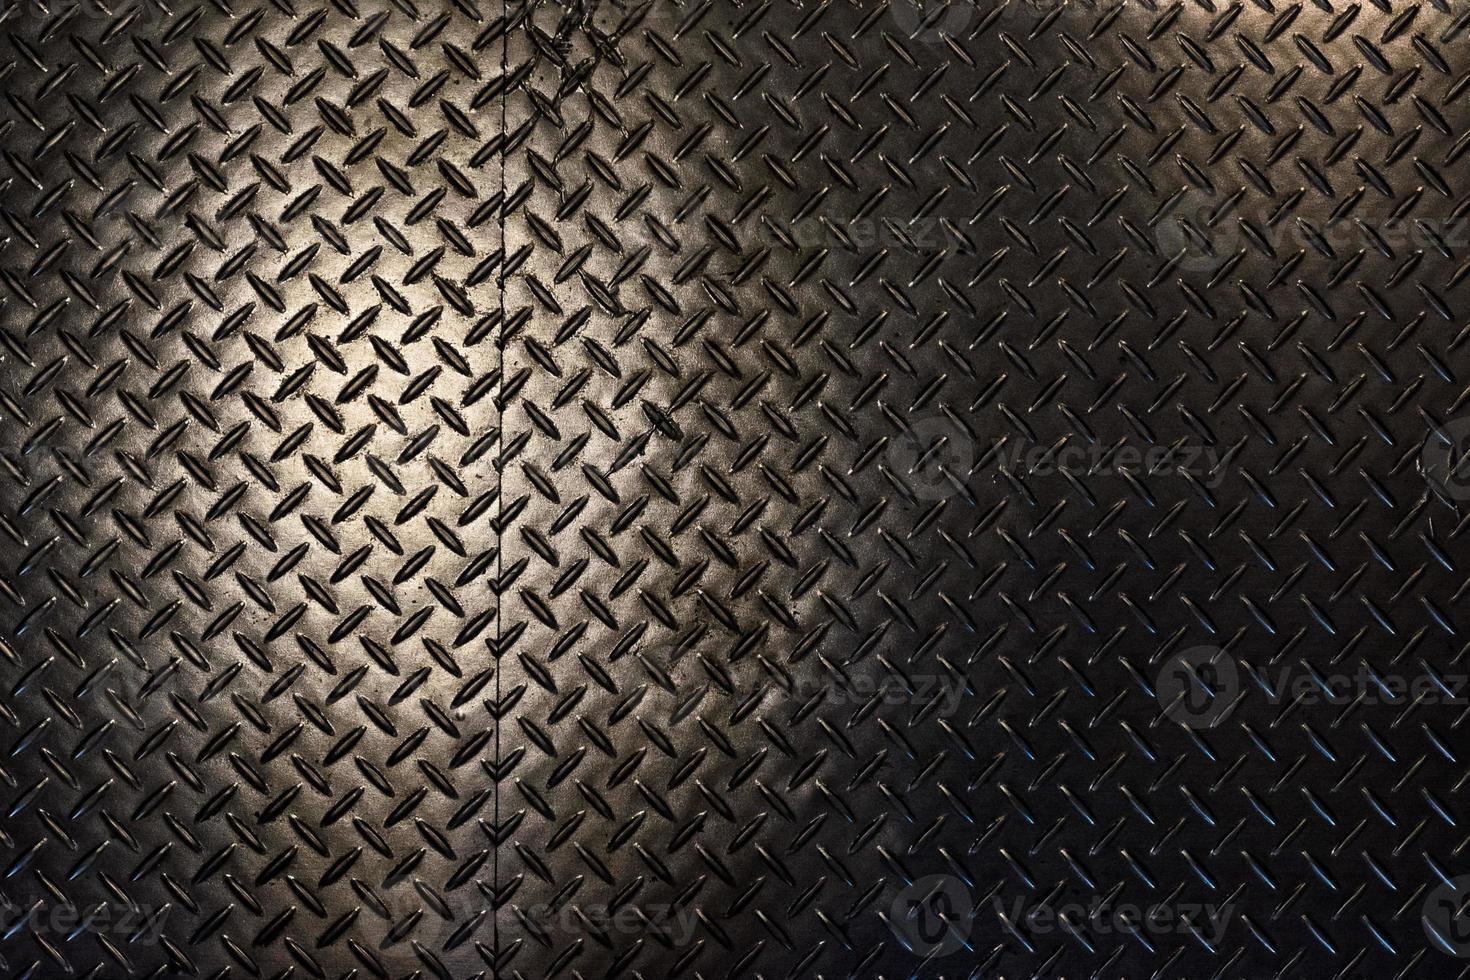 fond de texture en métal photo